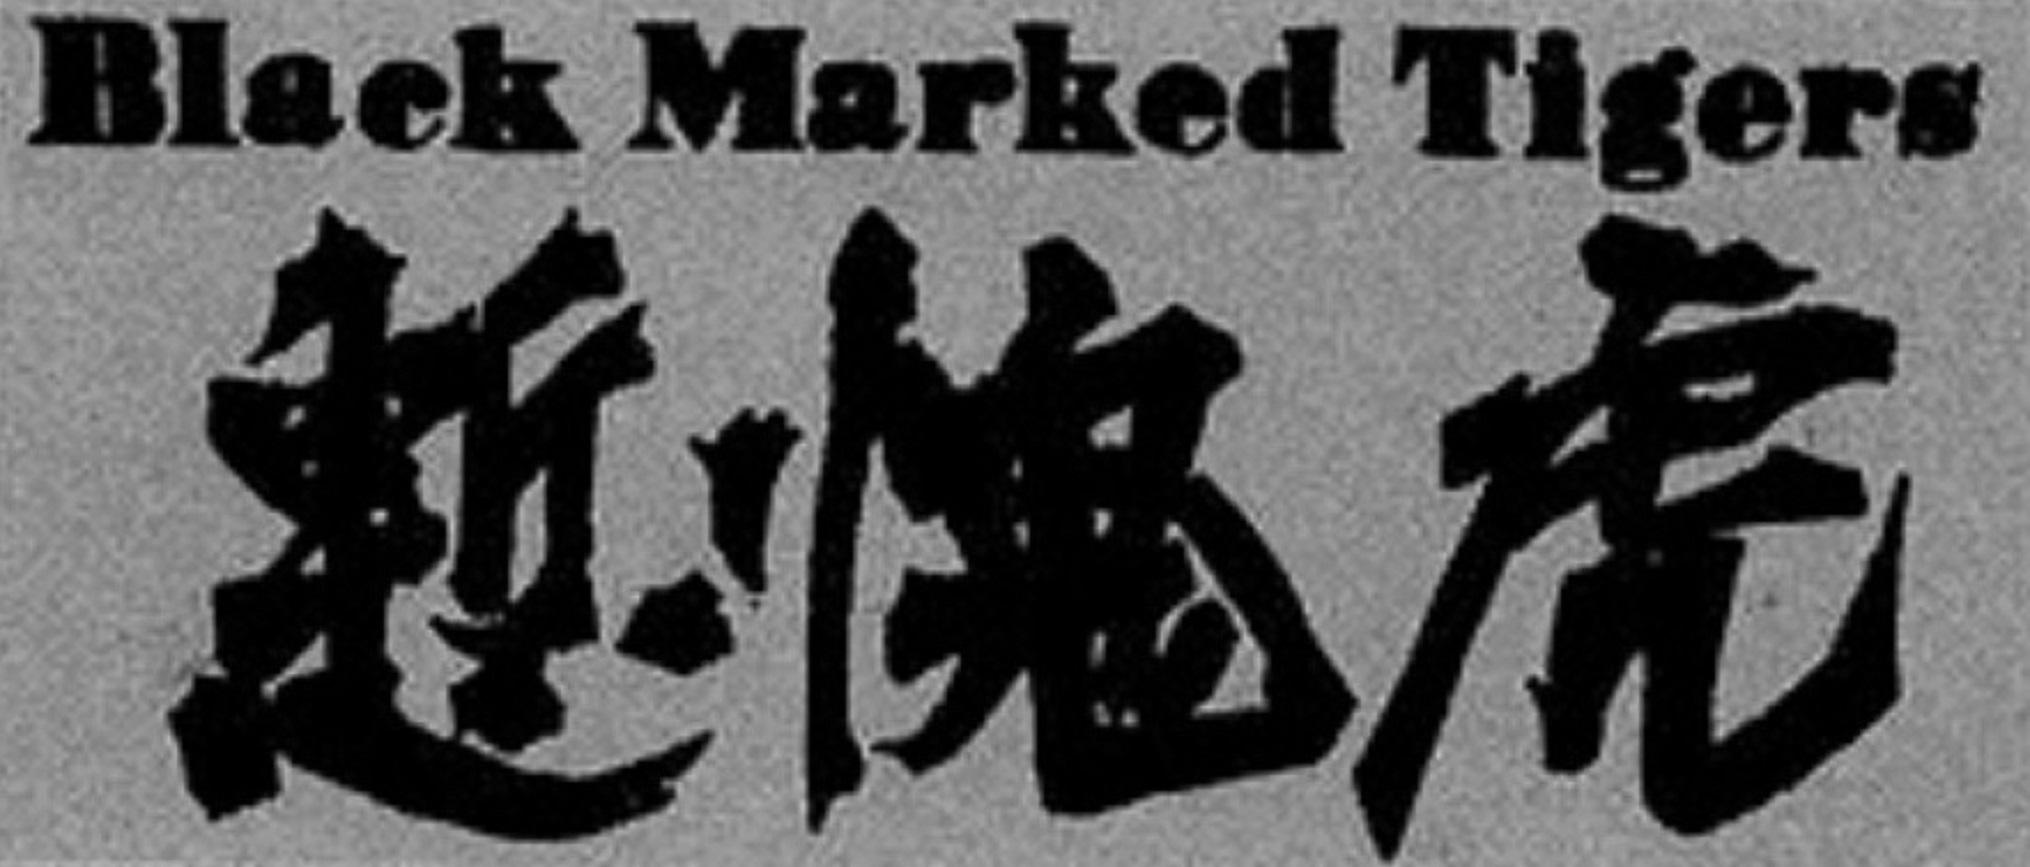 File:Blacked Marked Tigers Flag.jpg